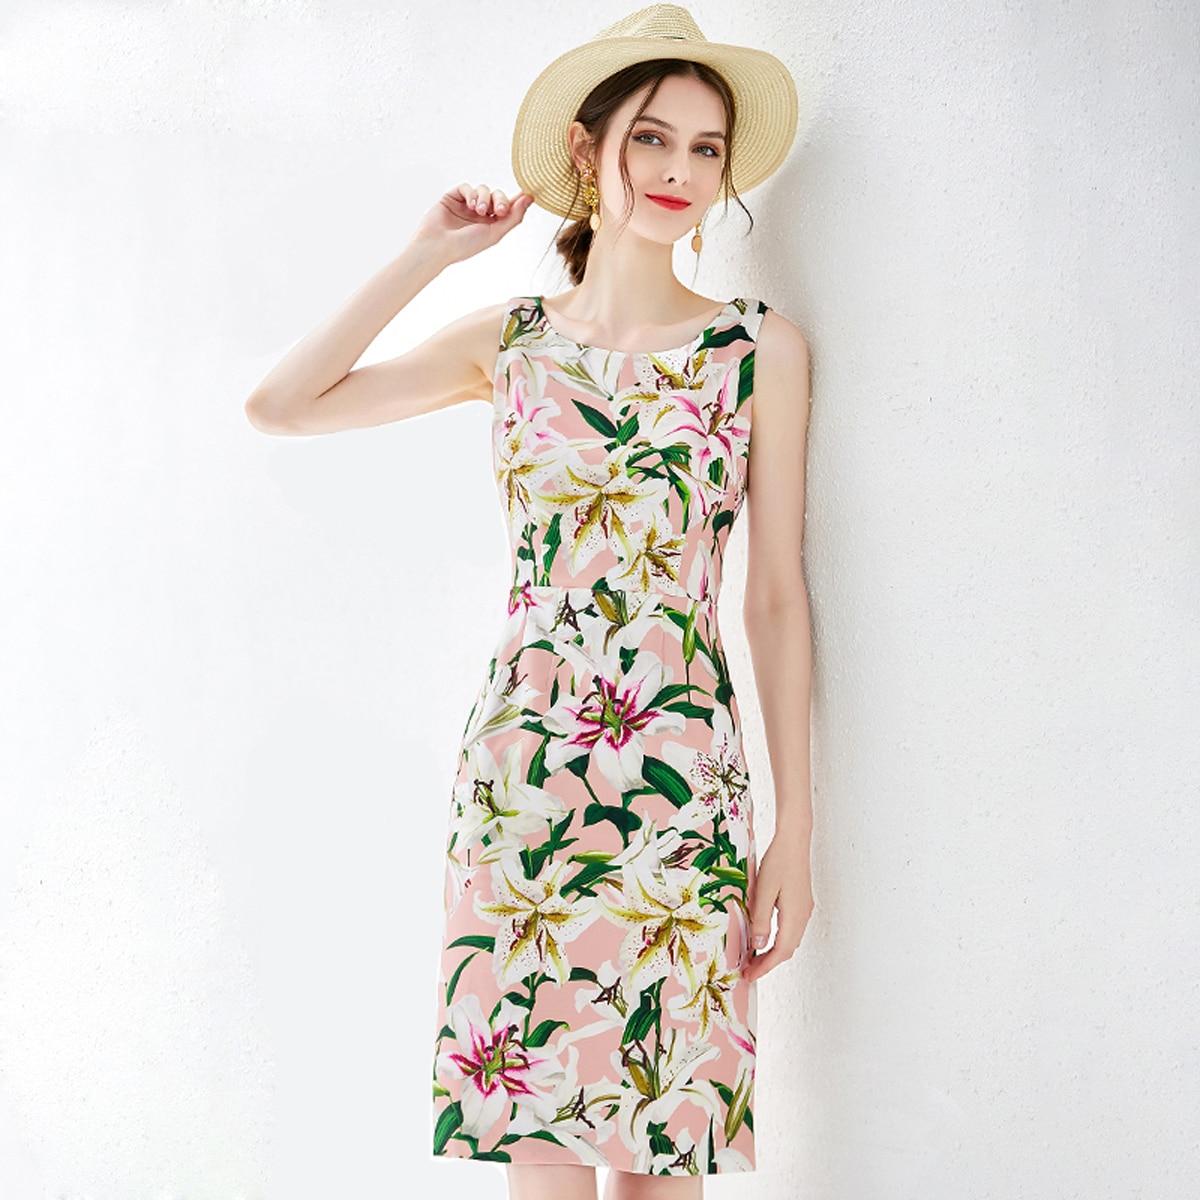 Red RoosaRosee New Women Summer Runway Designer Dress Fashion Sleeveless Floral Print Elegant Vintage Mini Dresses